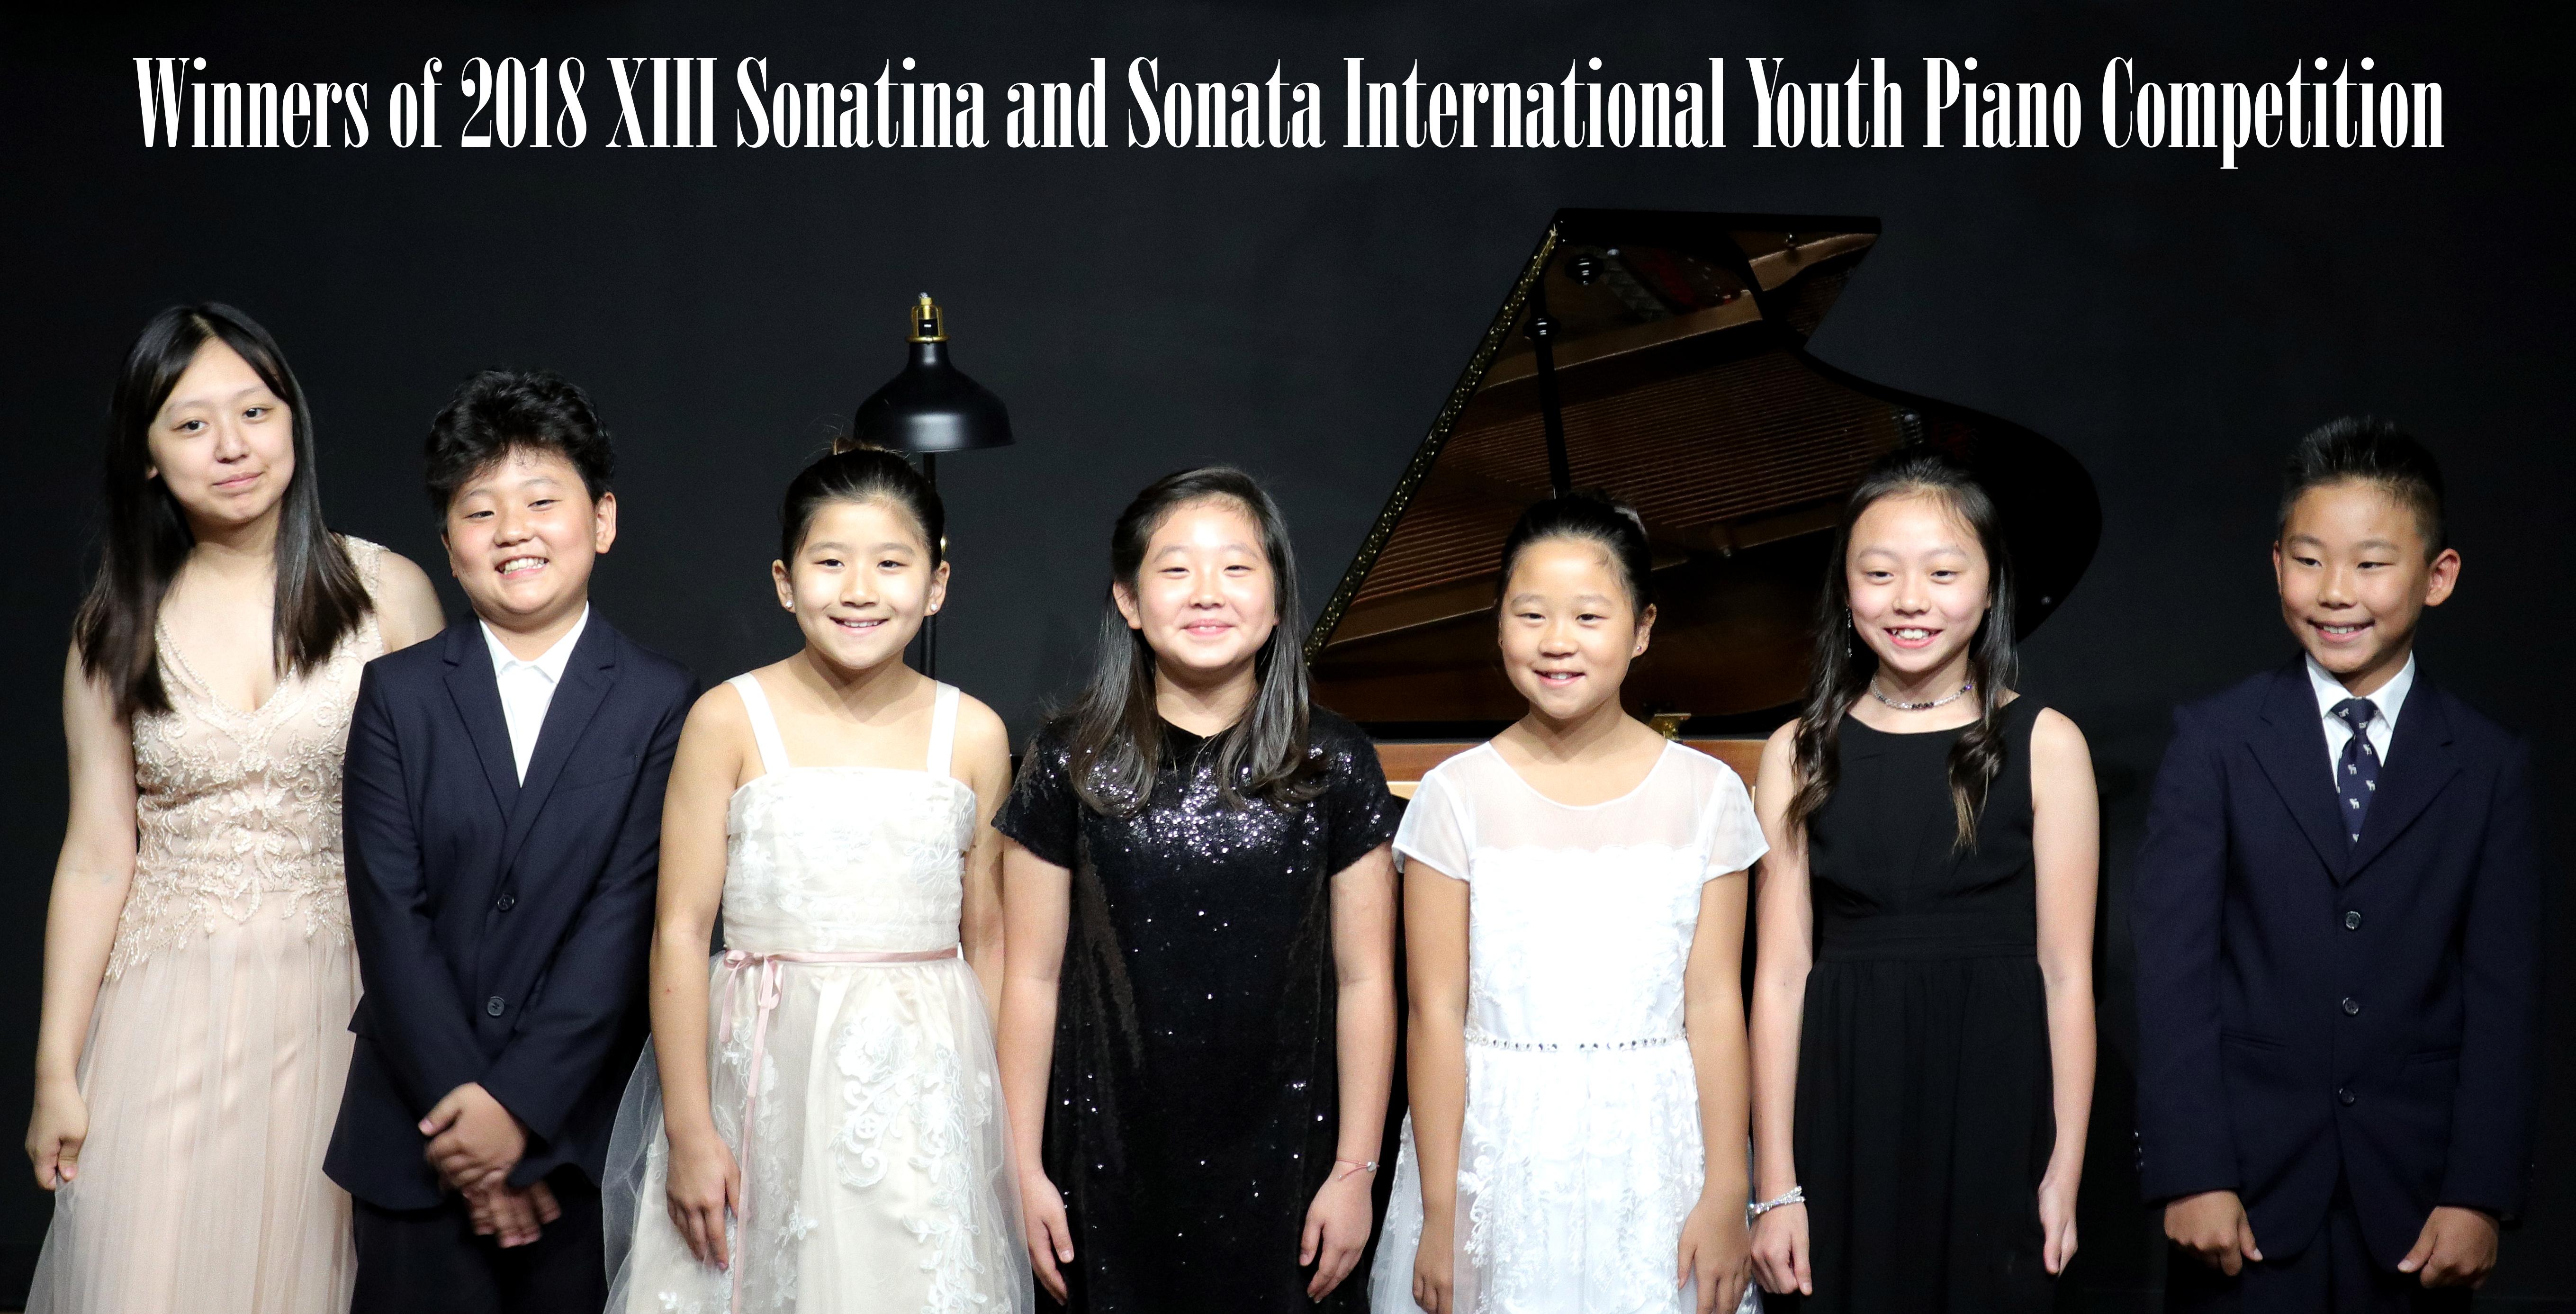 Winners of 2018 XIII Sonatina and Sonata